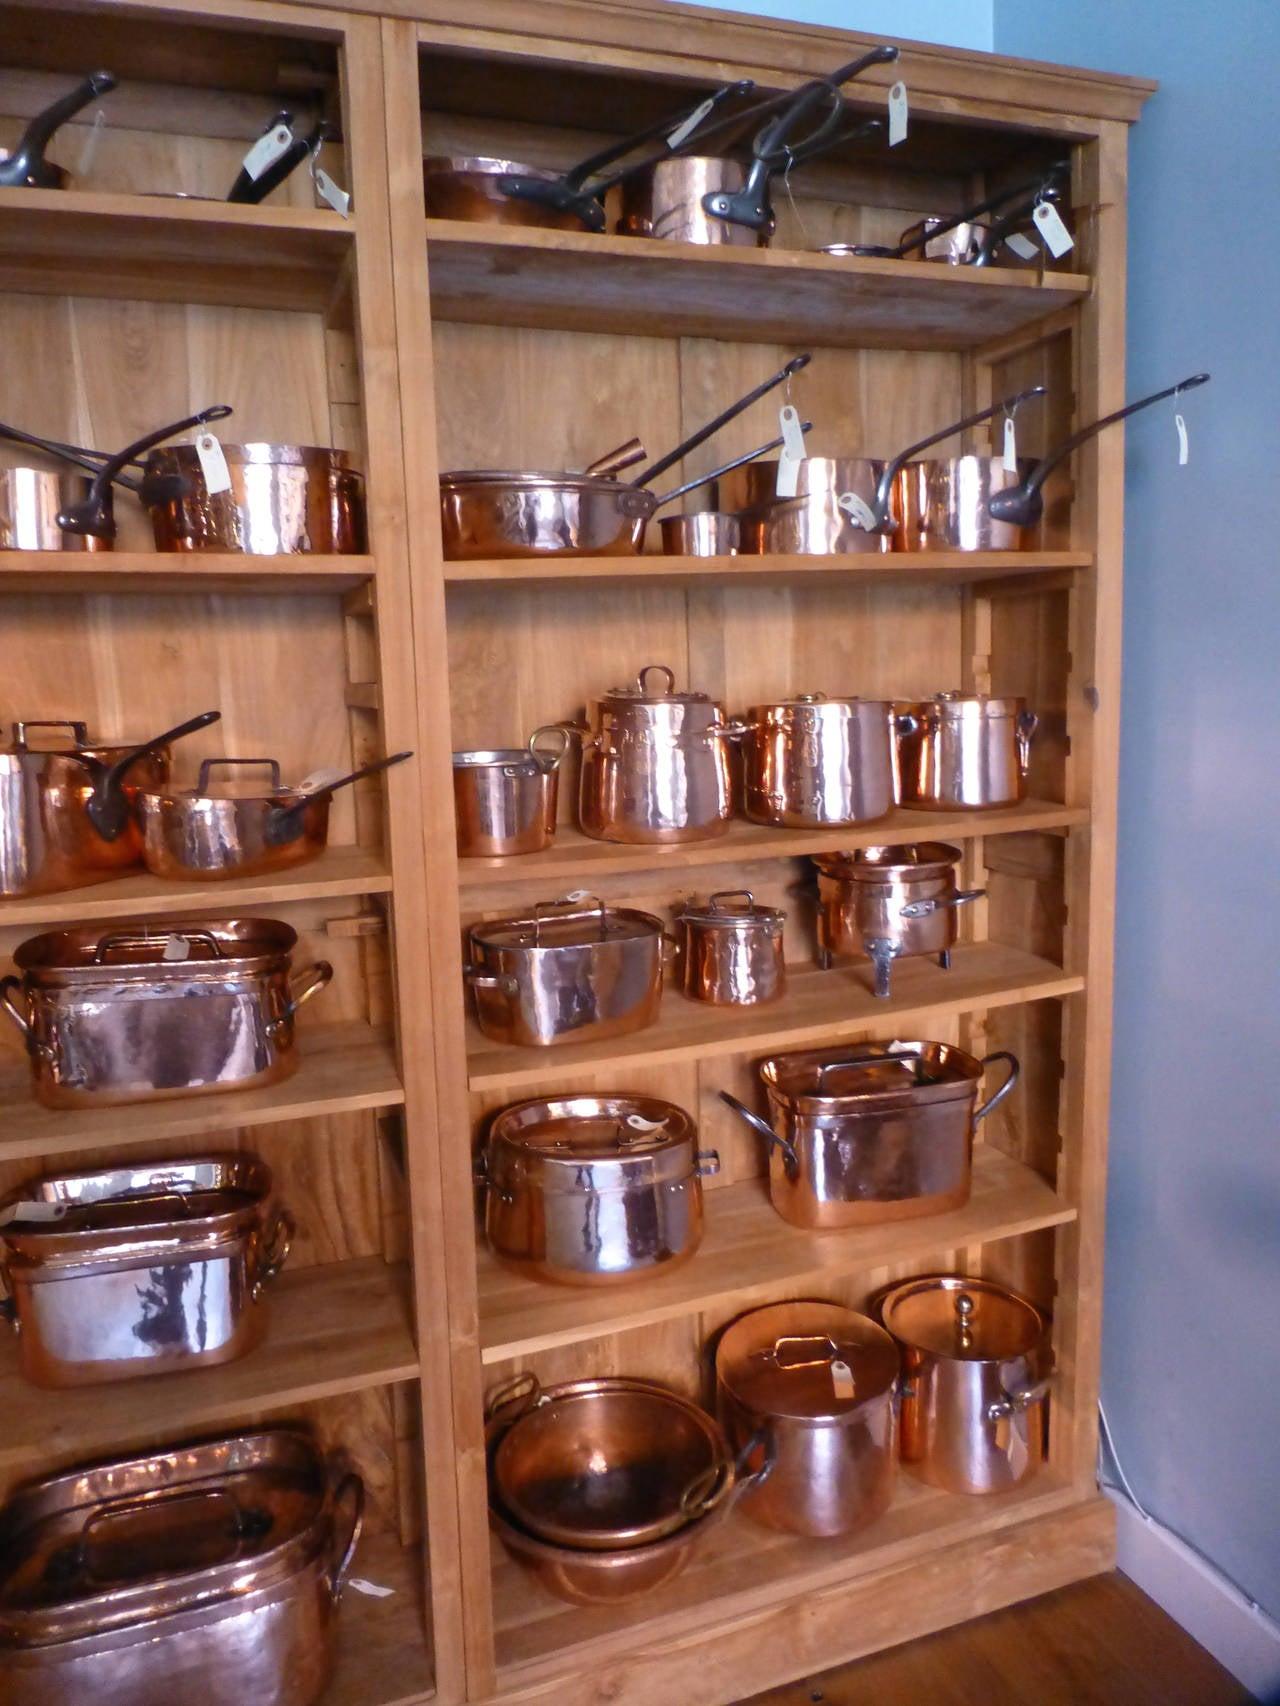 Exceptional 18th 19th century copper batterie de la for 18th century french cuisine